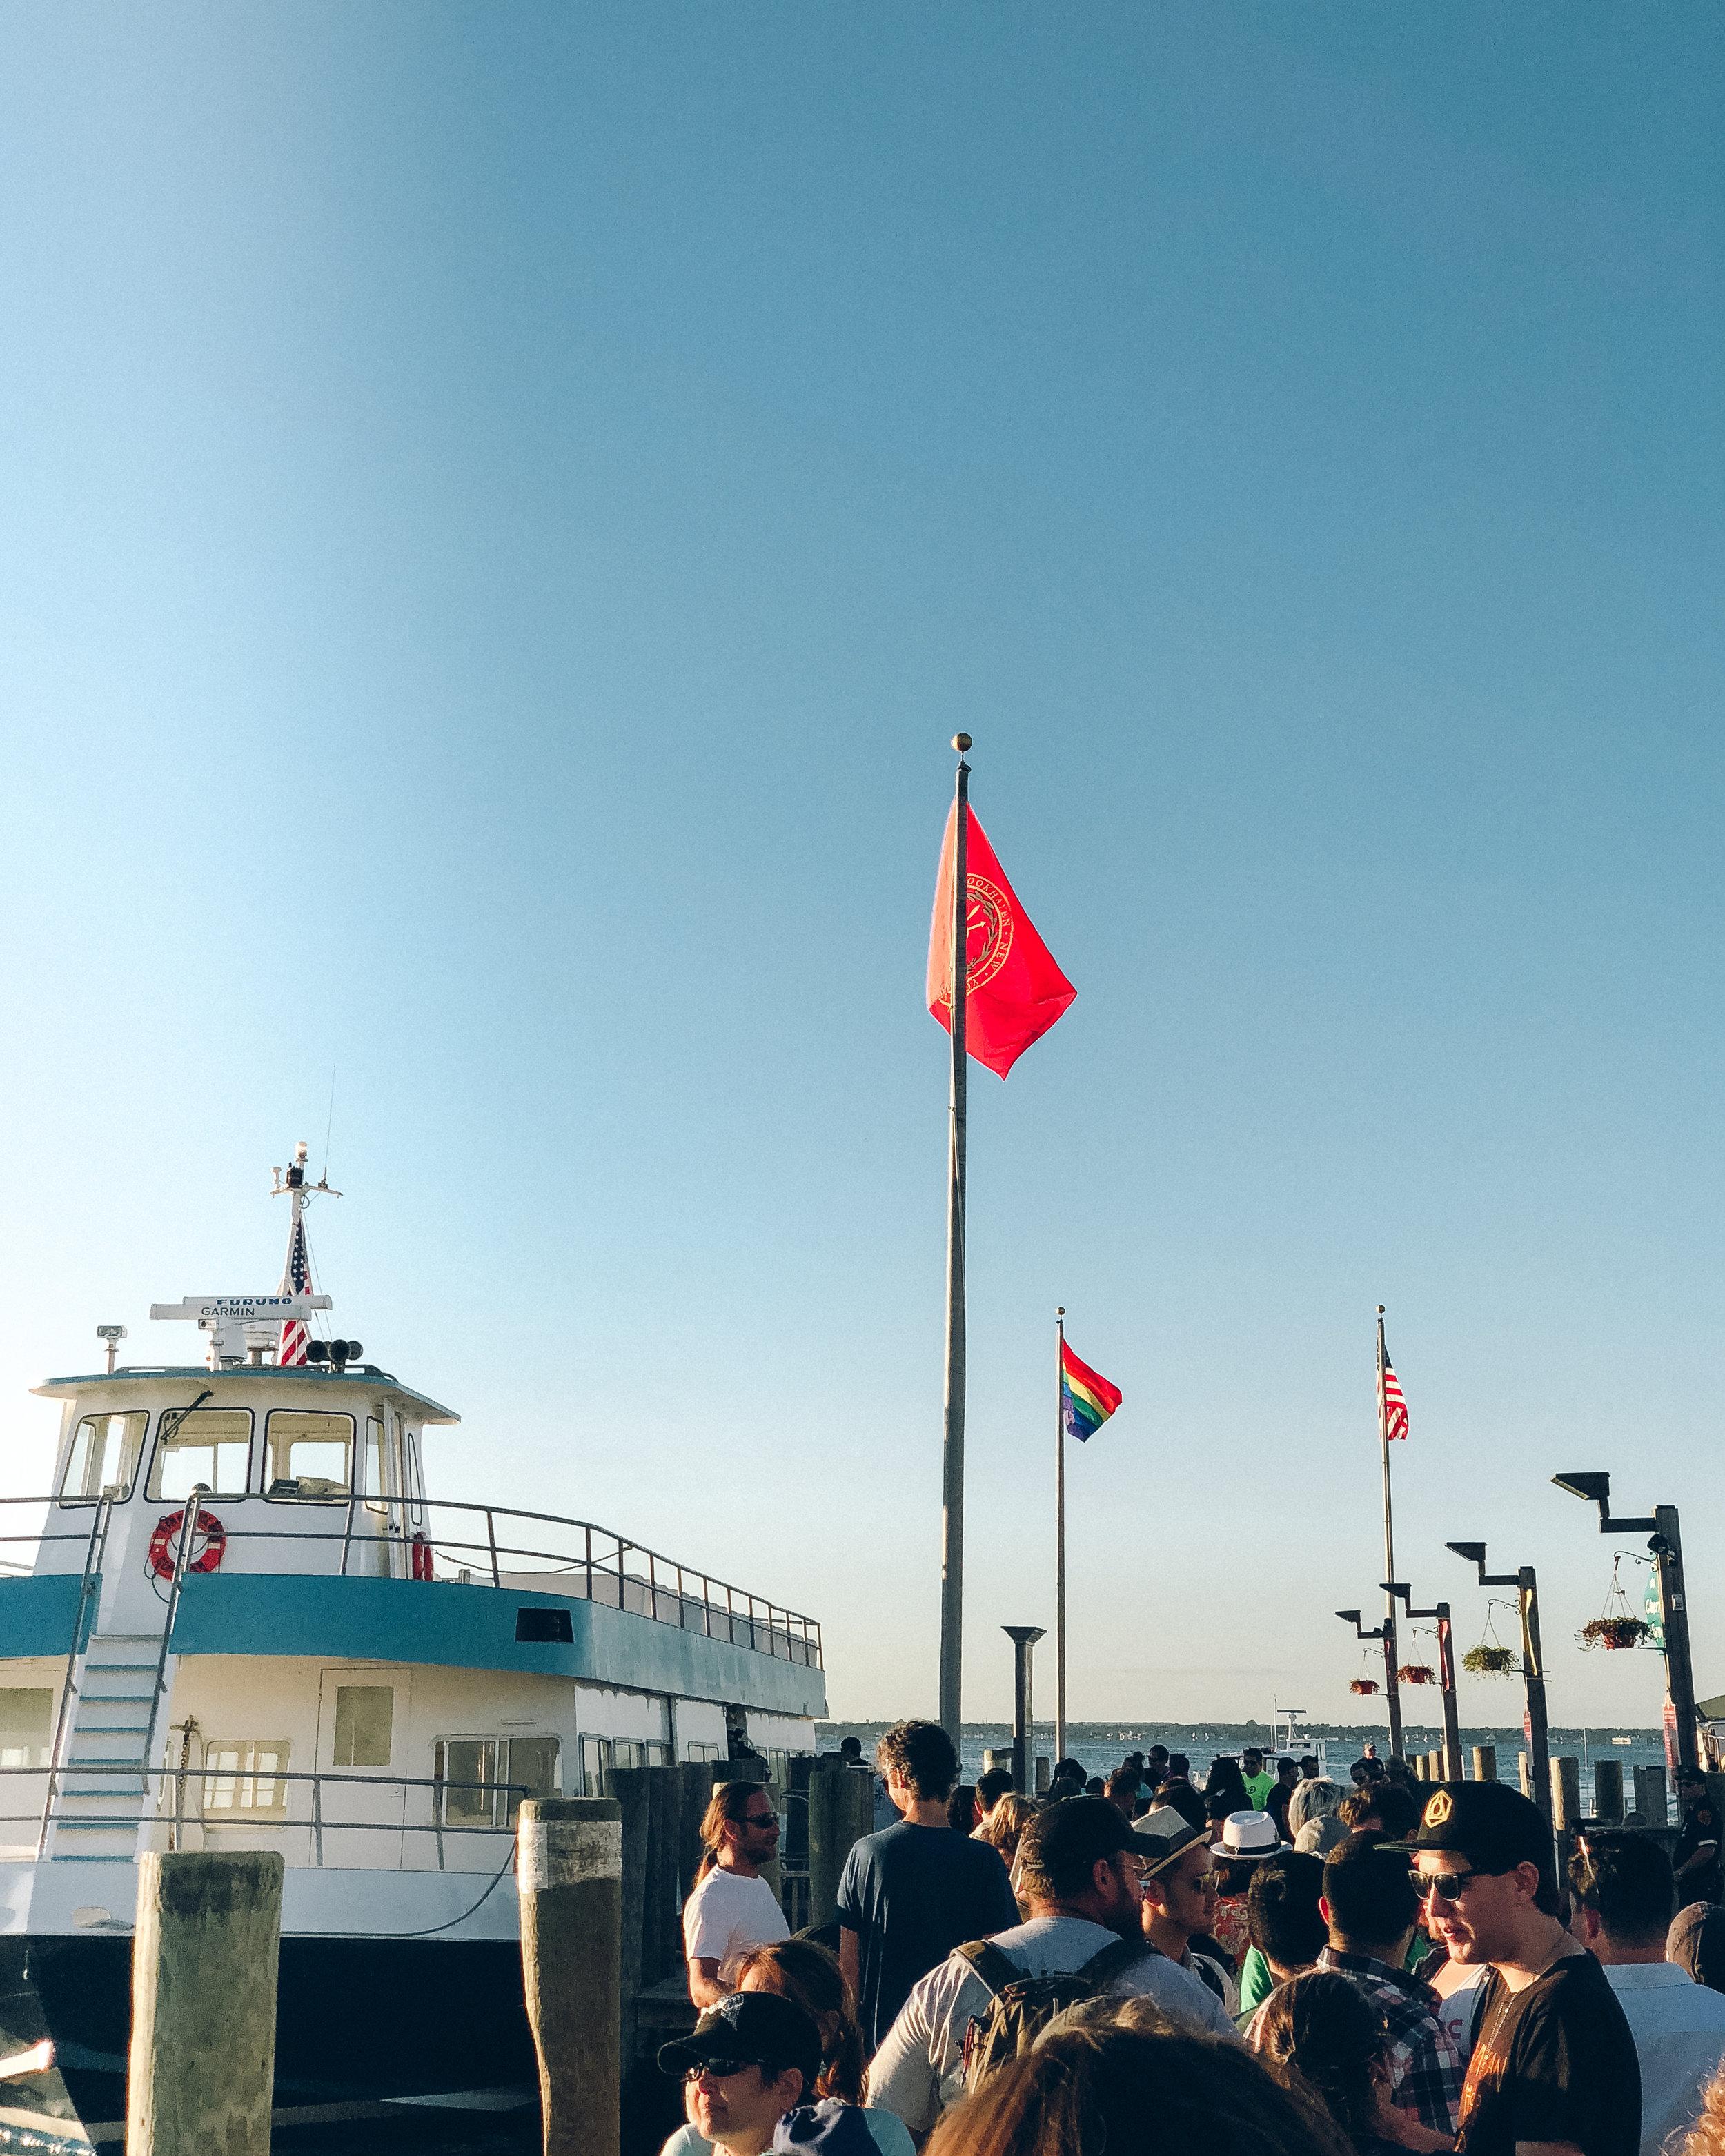 fire-island-ferry